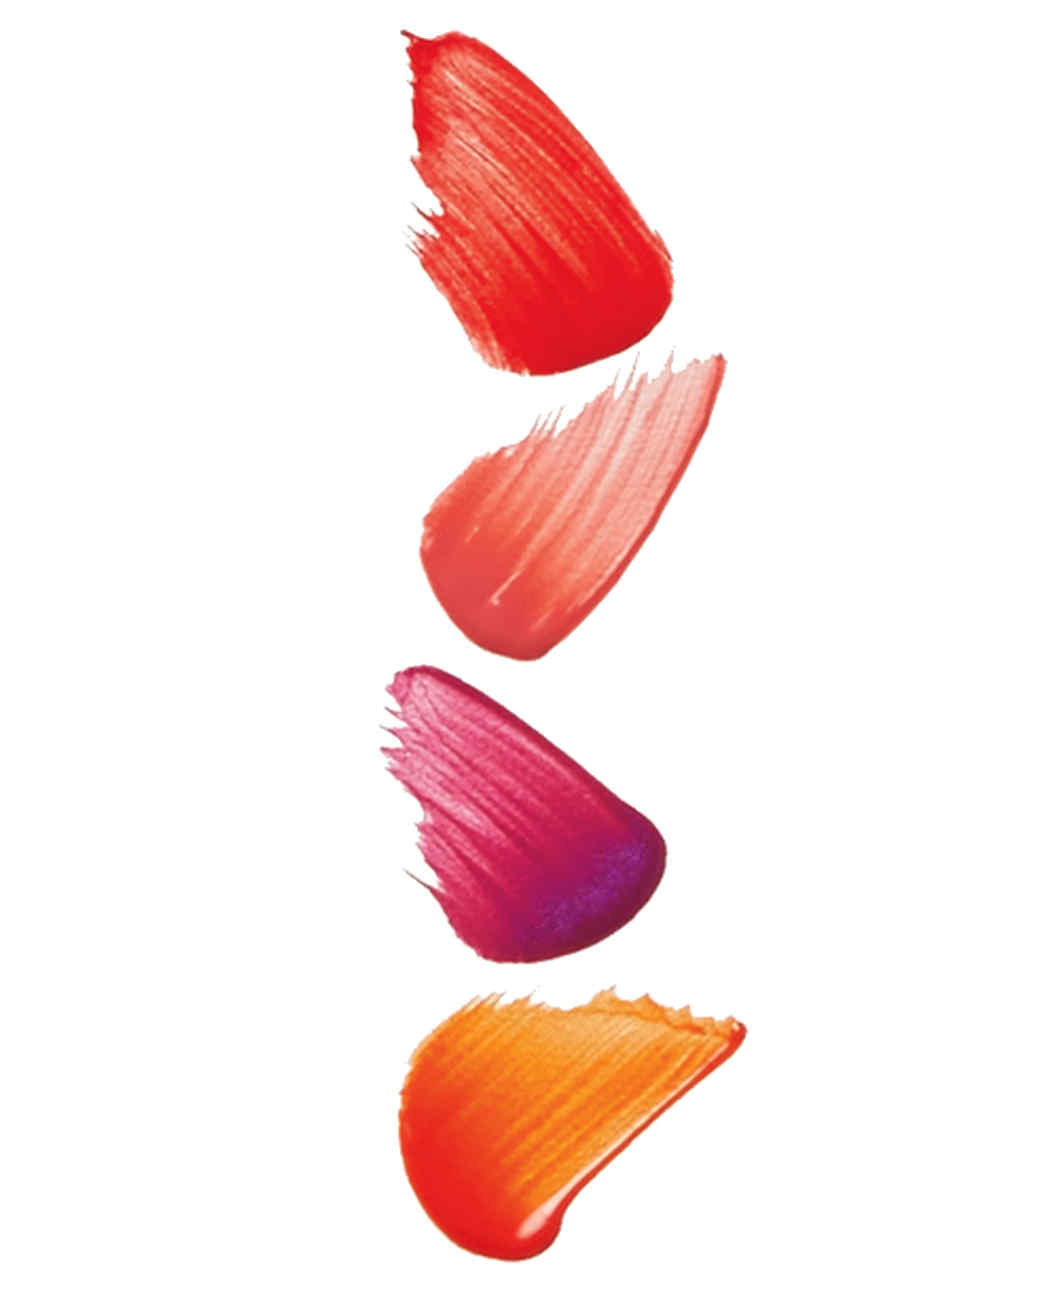 georgio-armani-lipstick-swipes-060-d112325.jpg